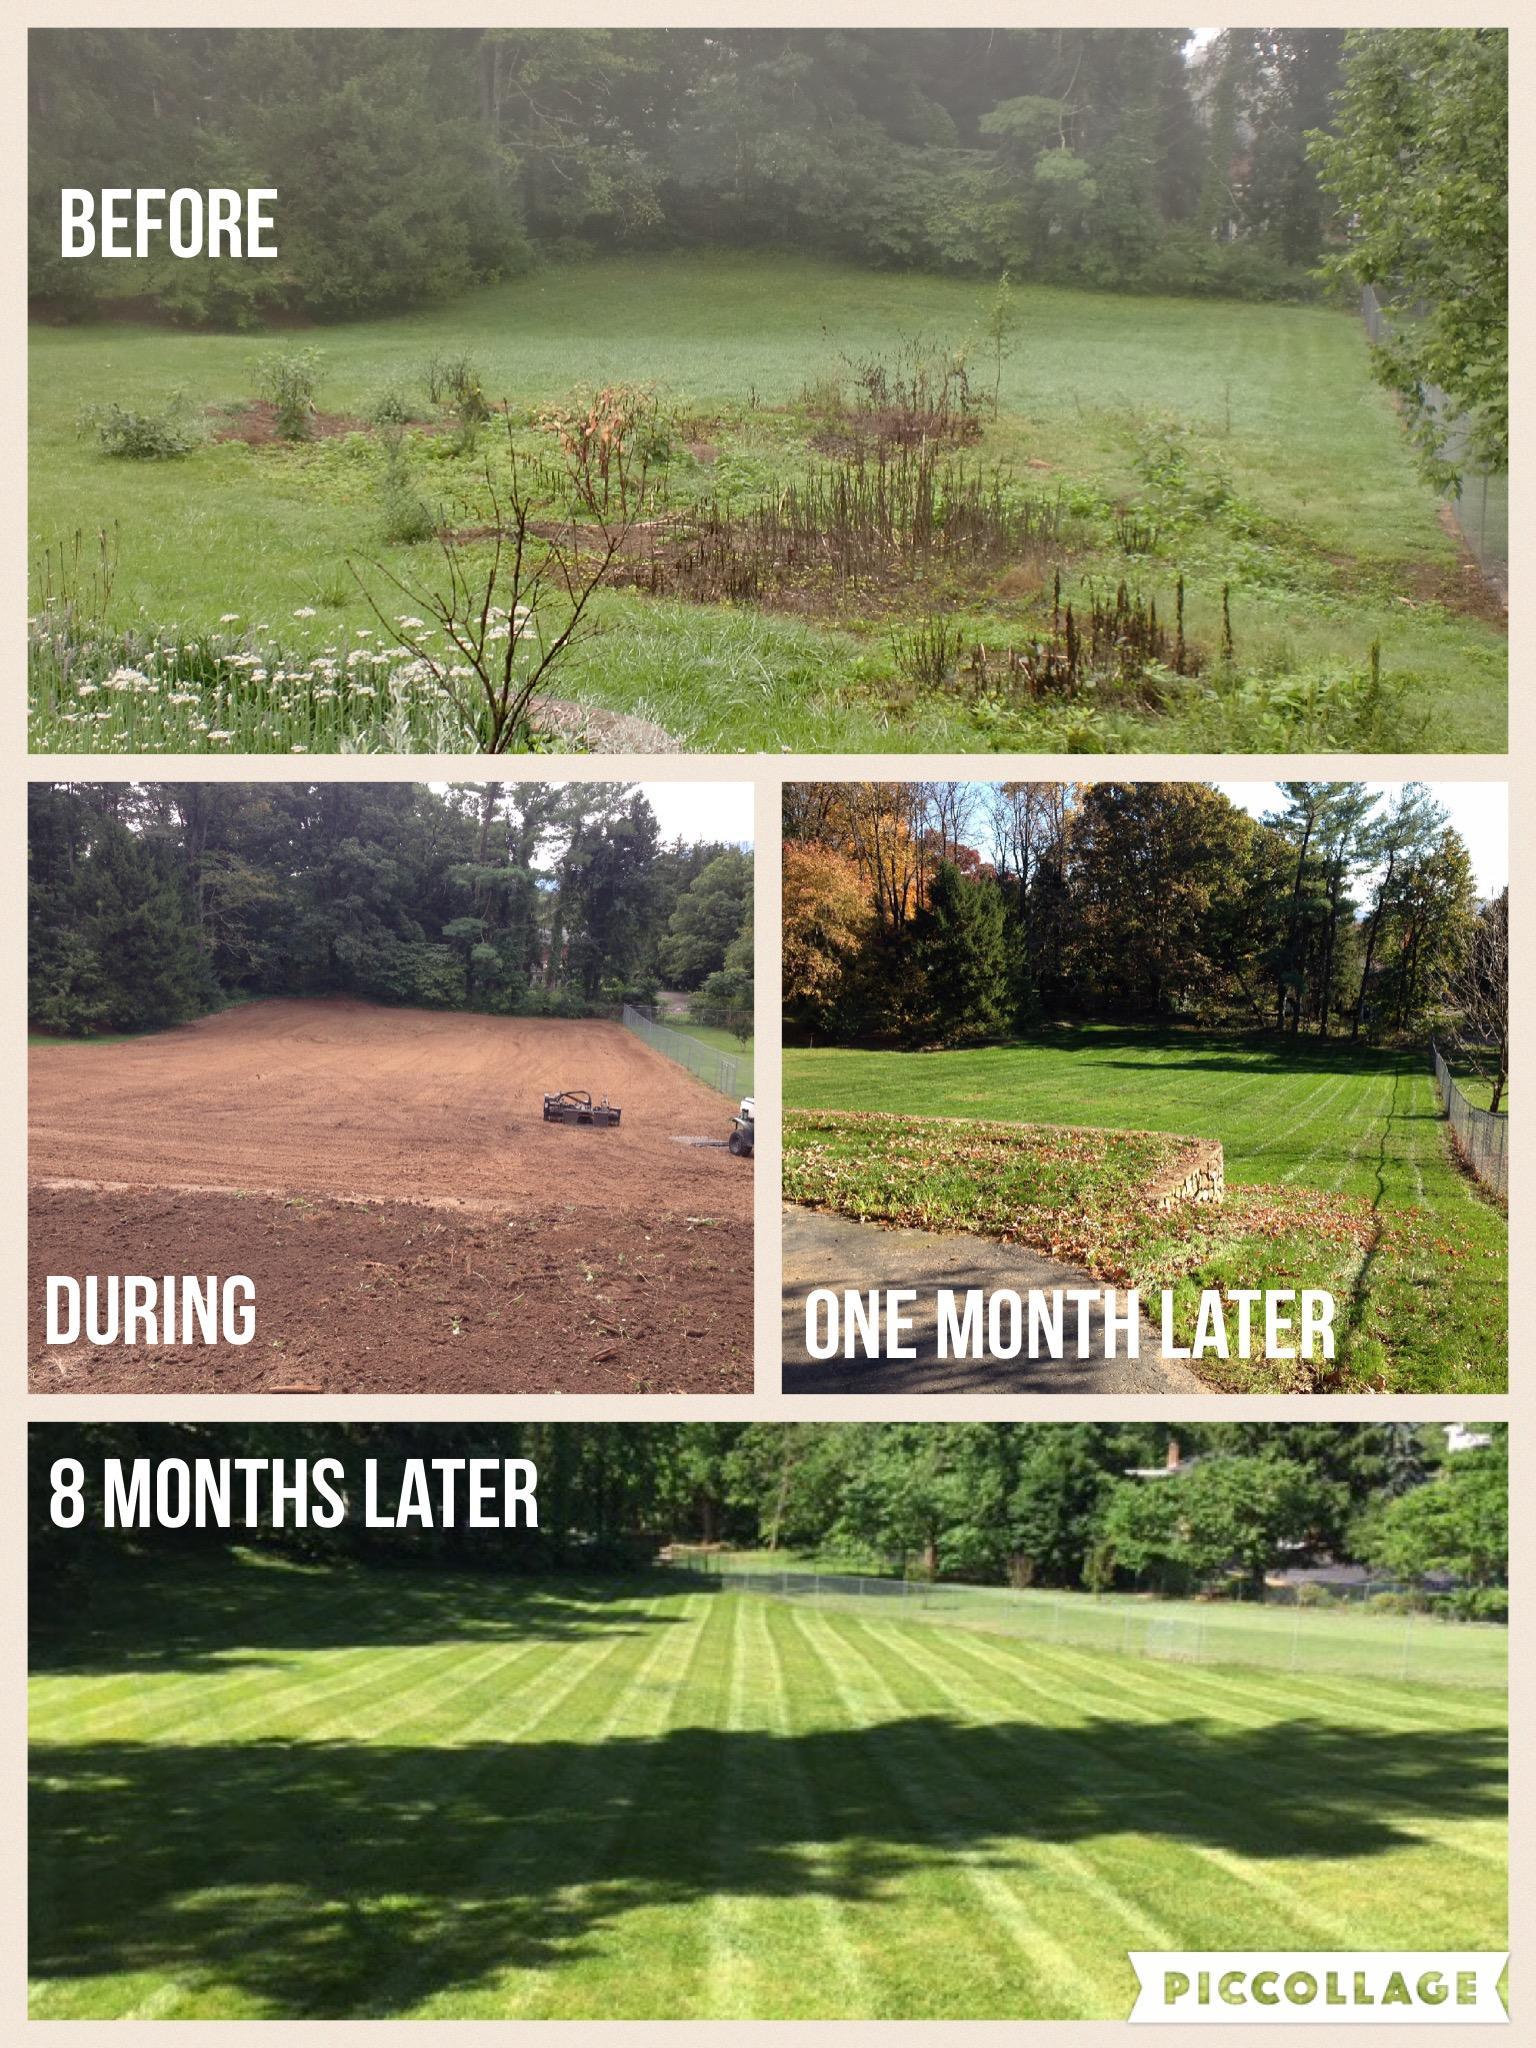 Paradise Landscaping & Design LLC image 7